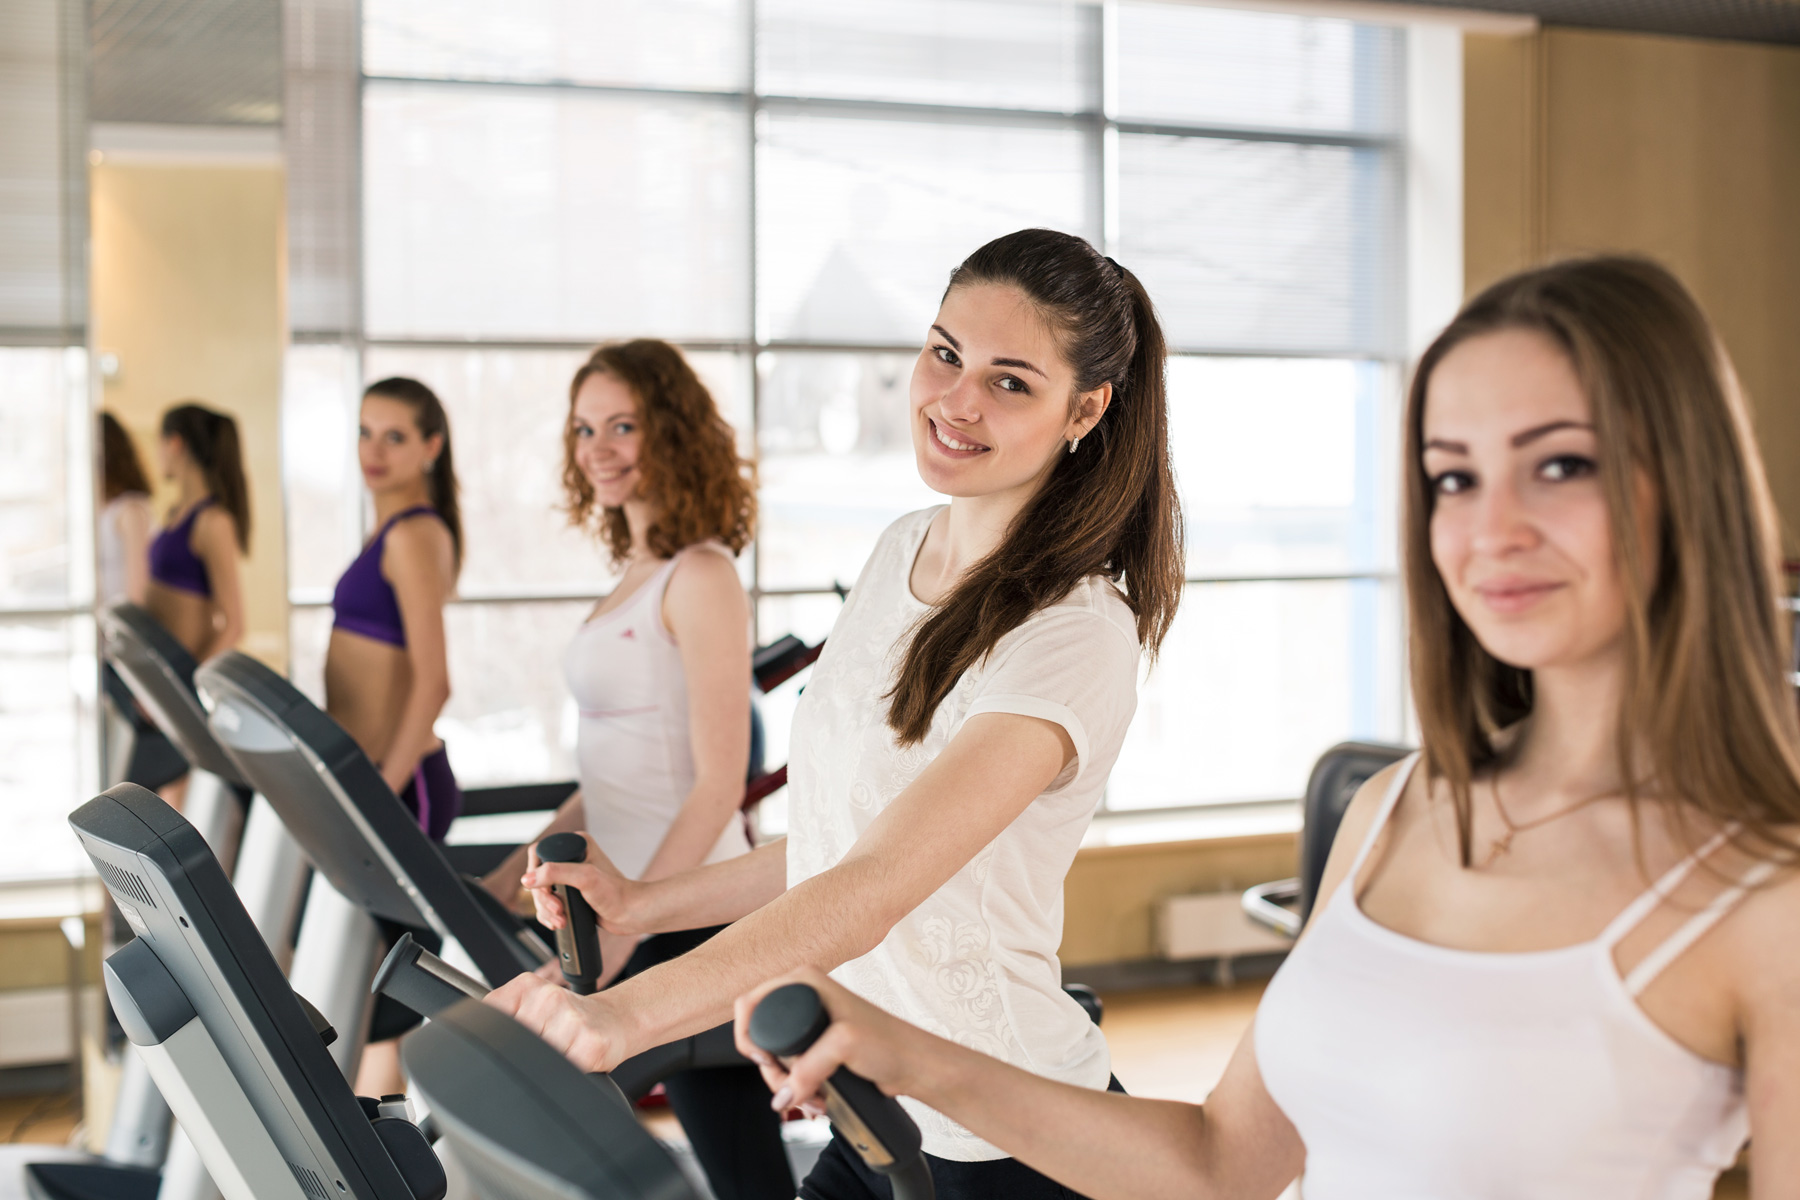 Calorie Burning Elliptical Workout